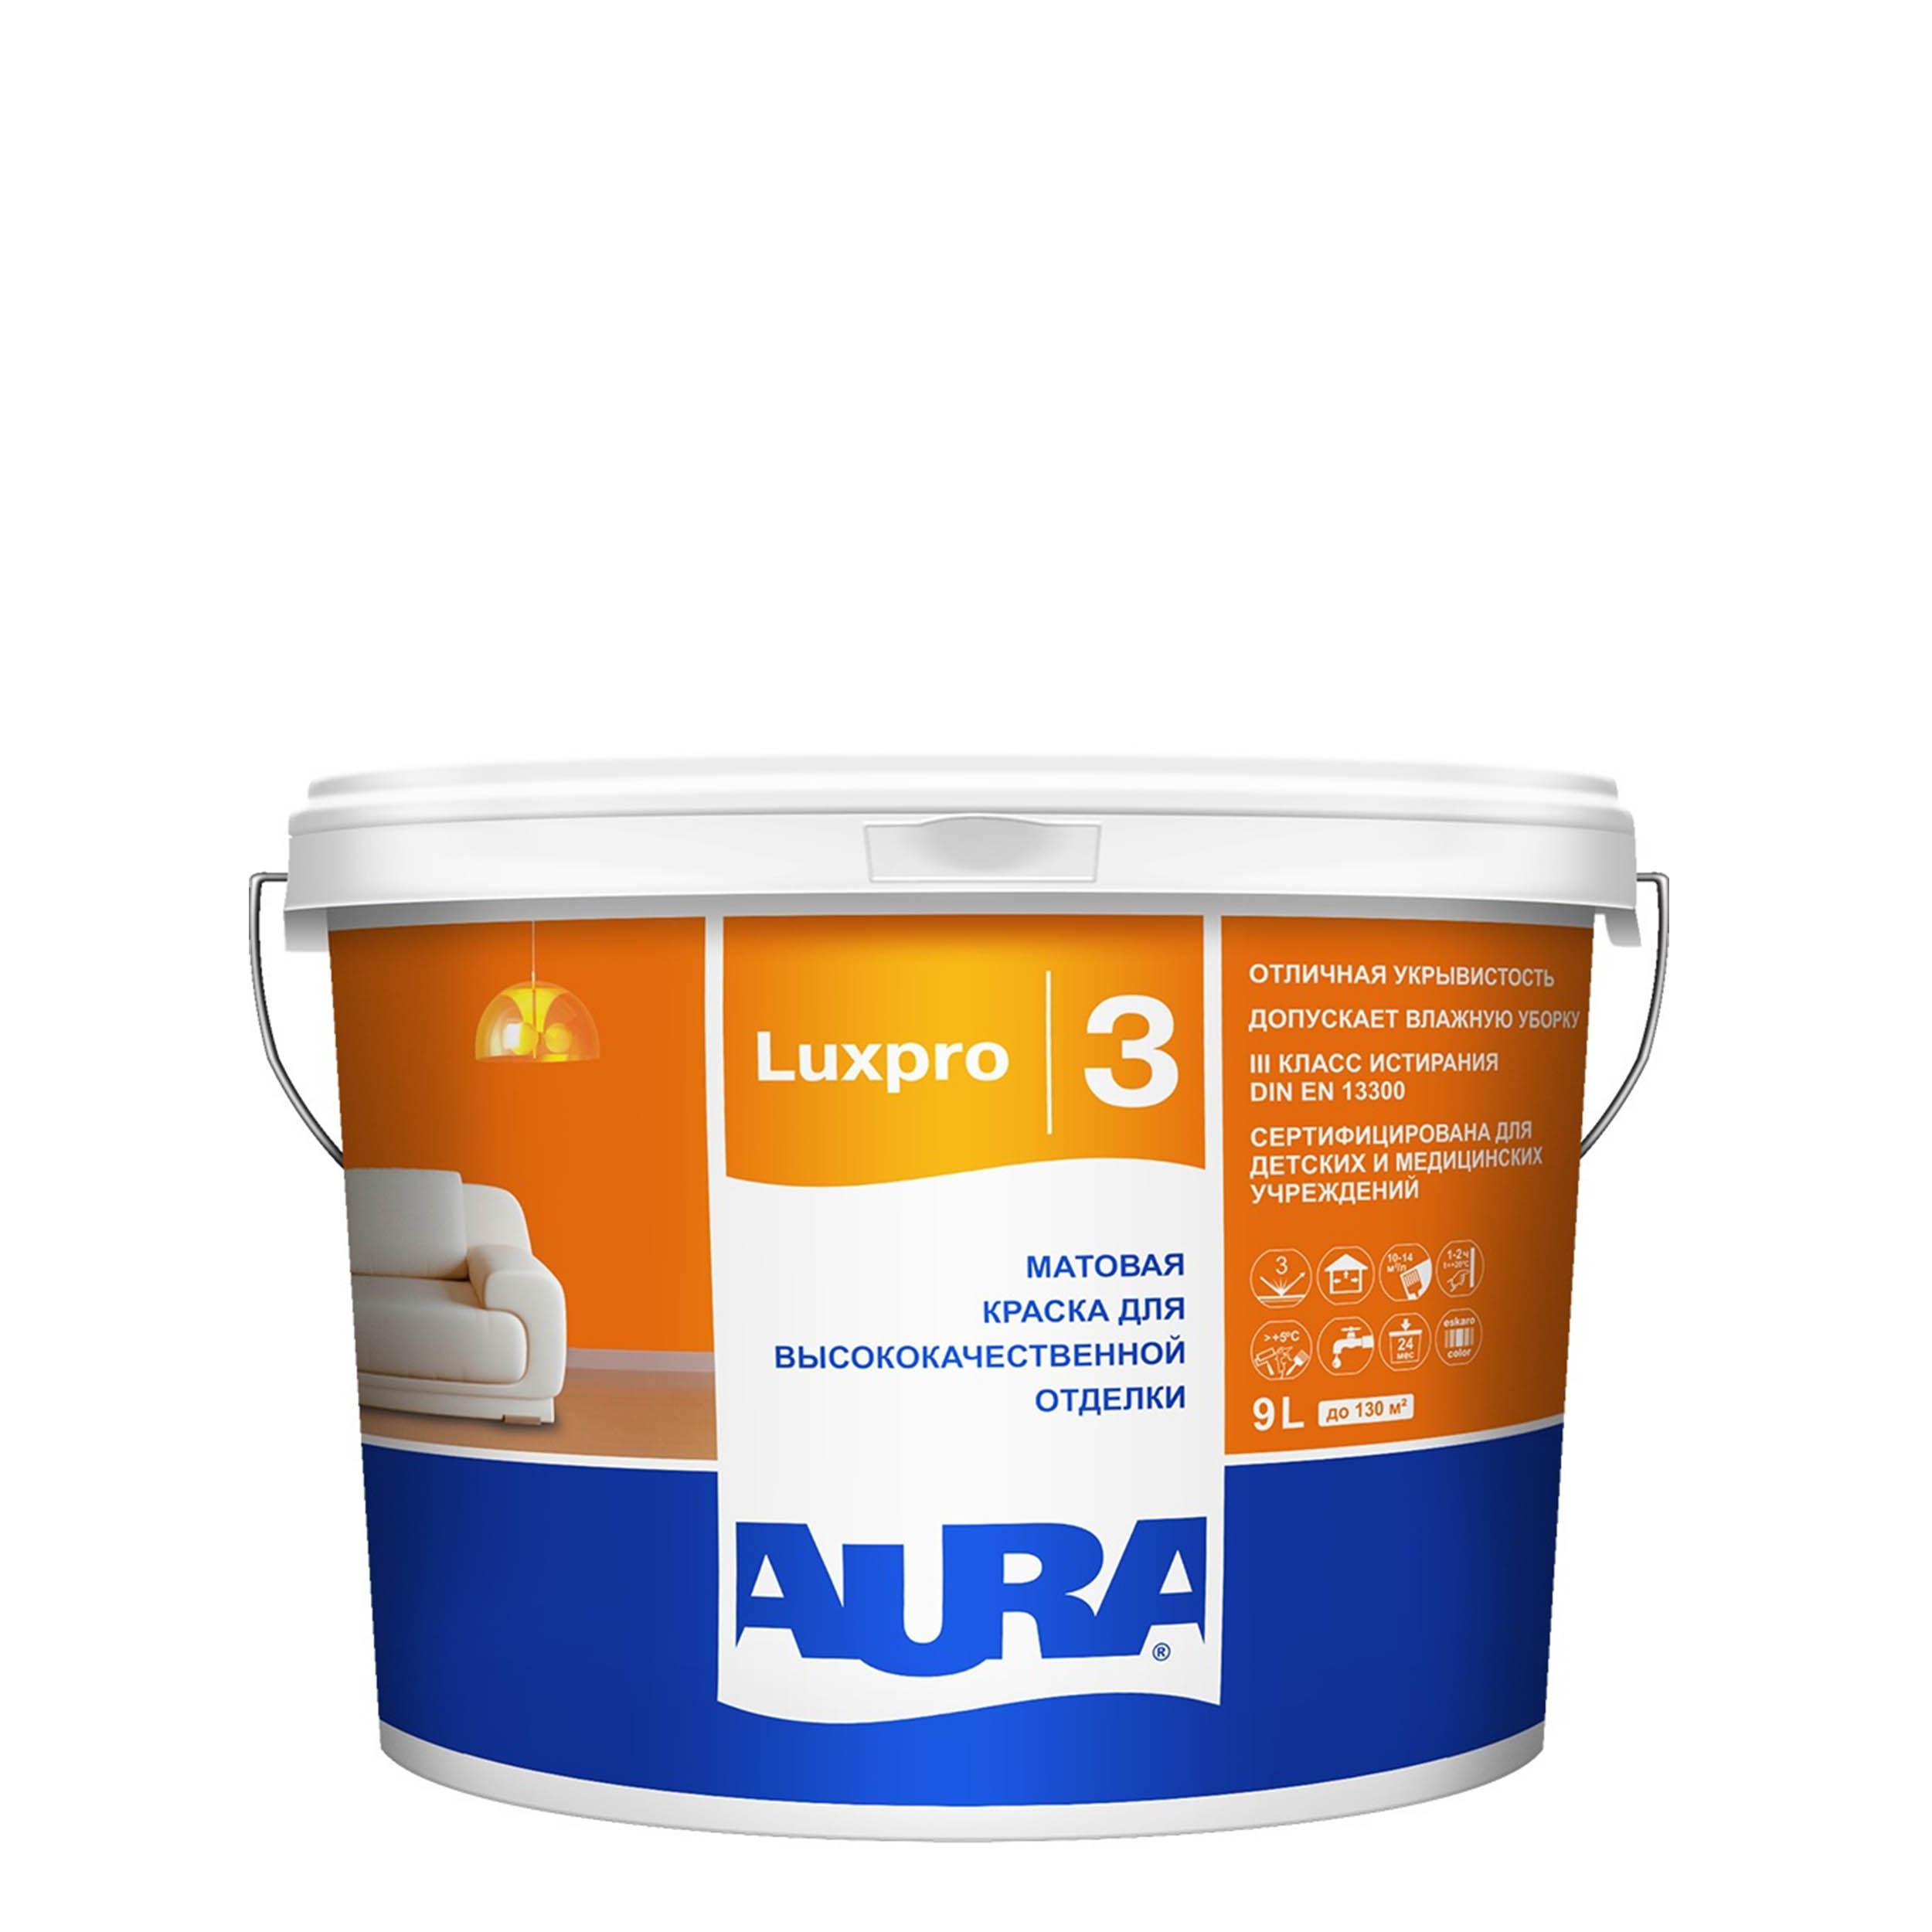 Фото 3 - Краска интерьерная, Aura LuxPRO 3, RAL 1002, 11 кг.